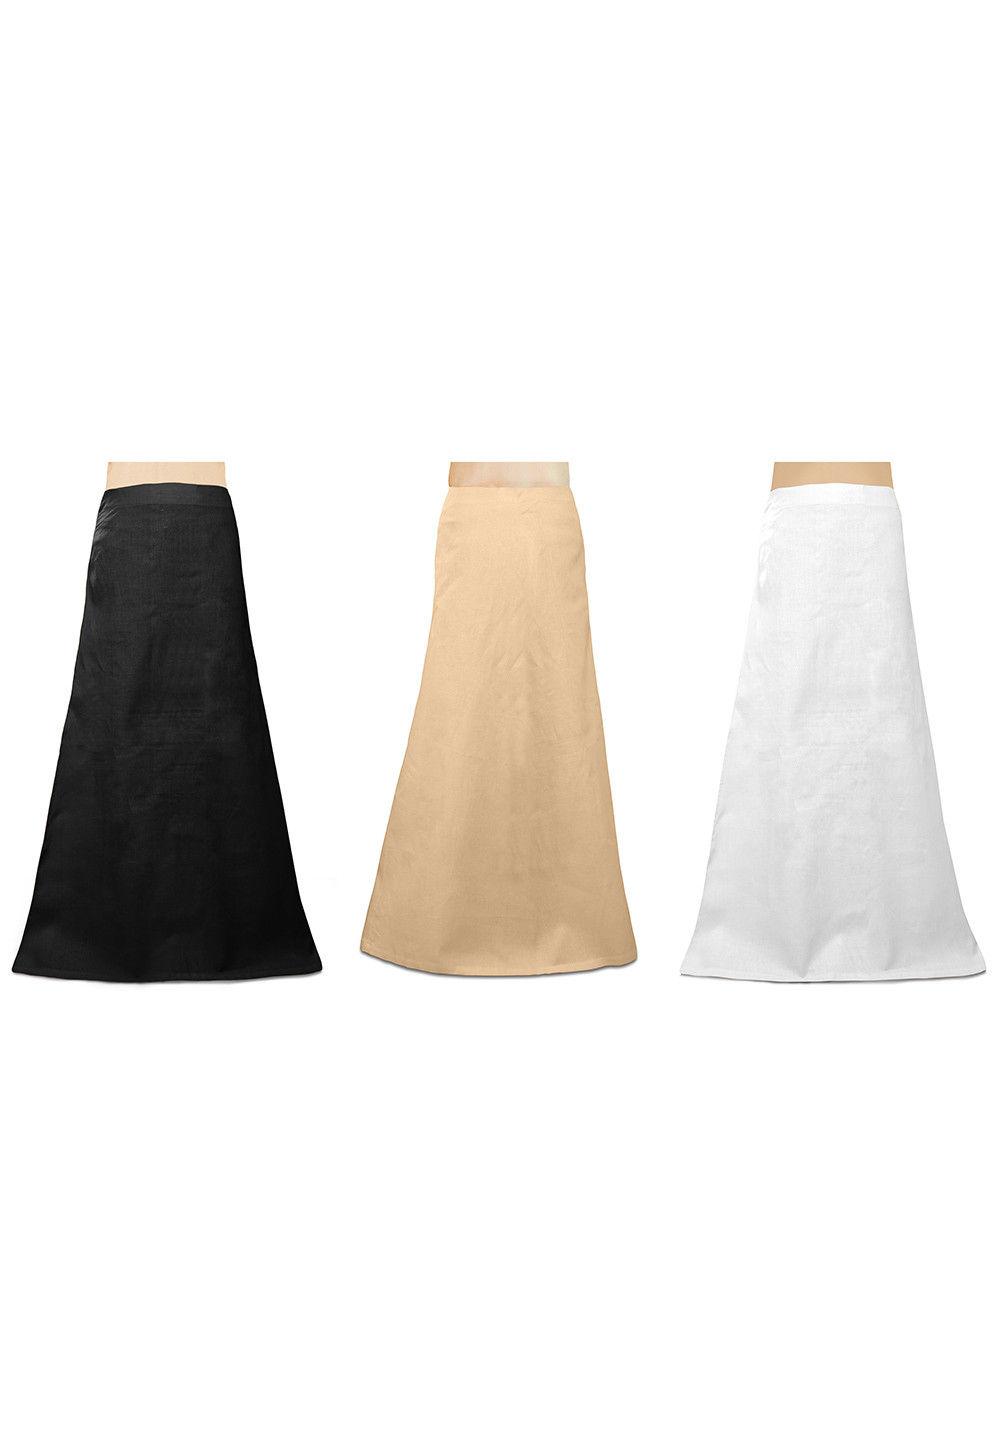 Cotton Combo Sets in Petticoat